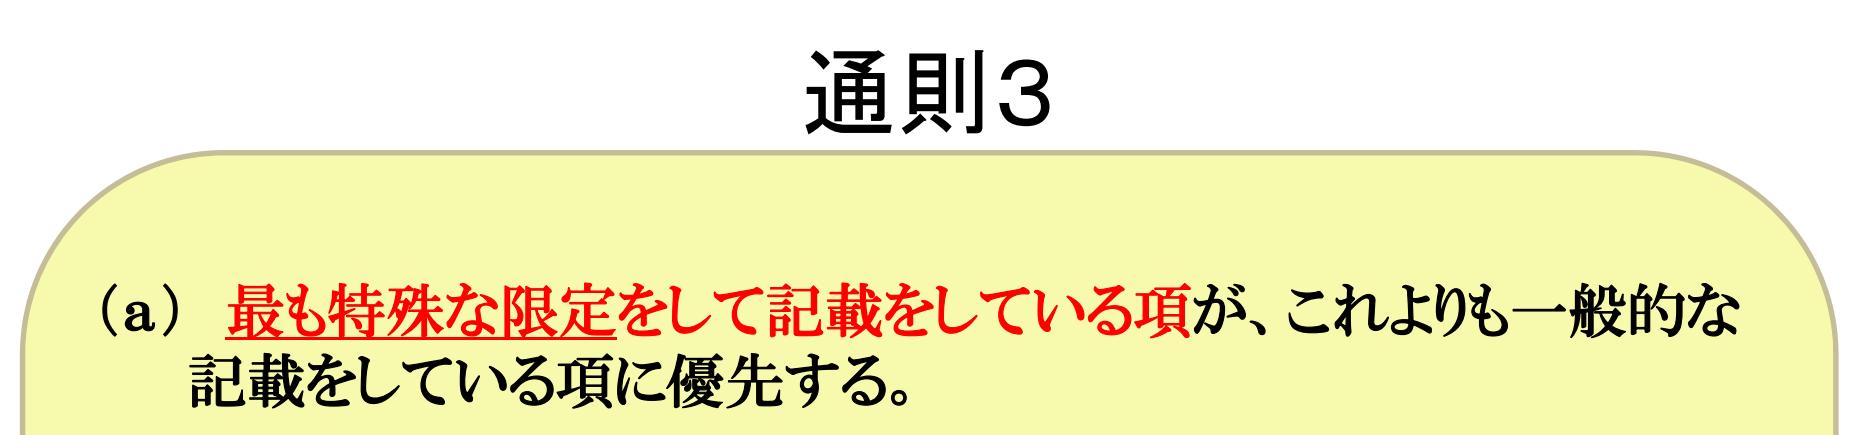 HSコード通則3(a)